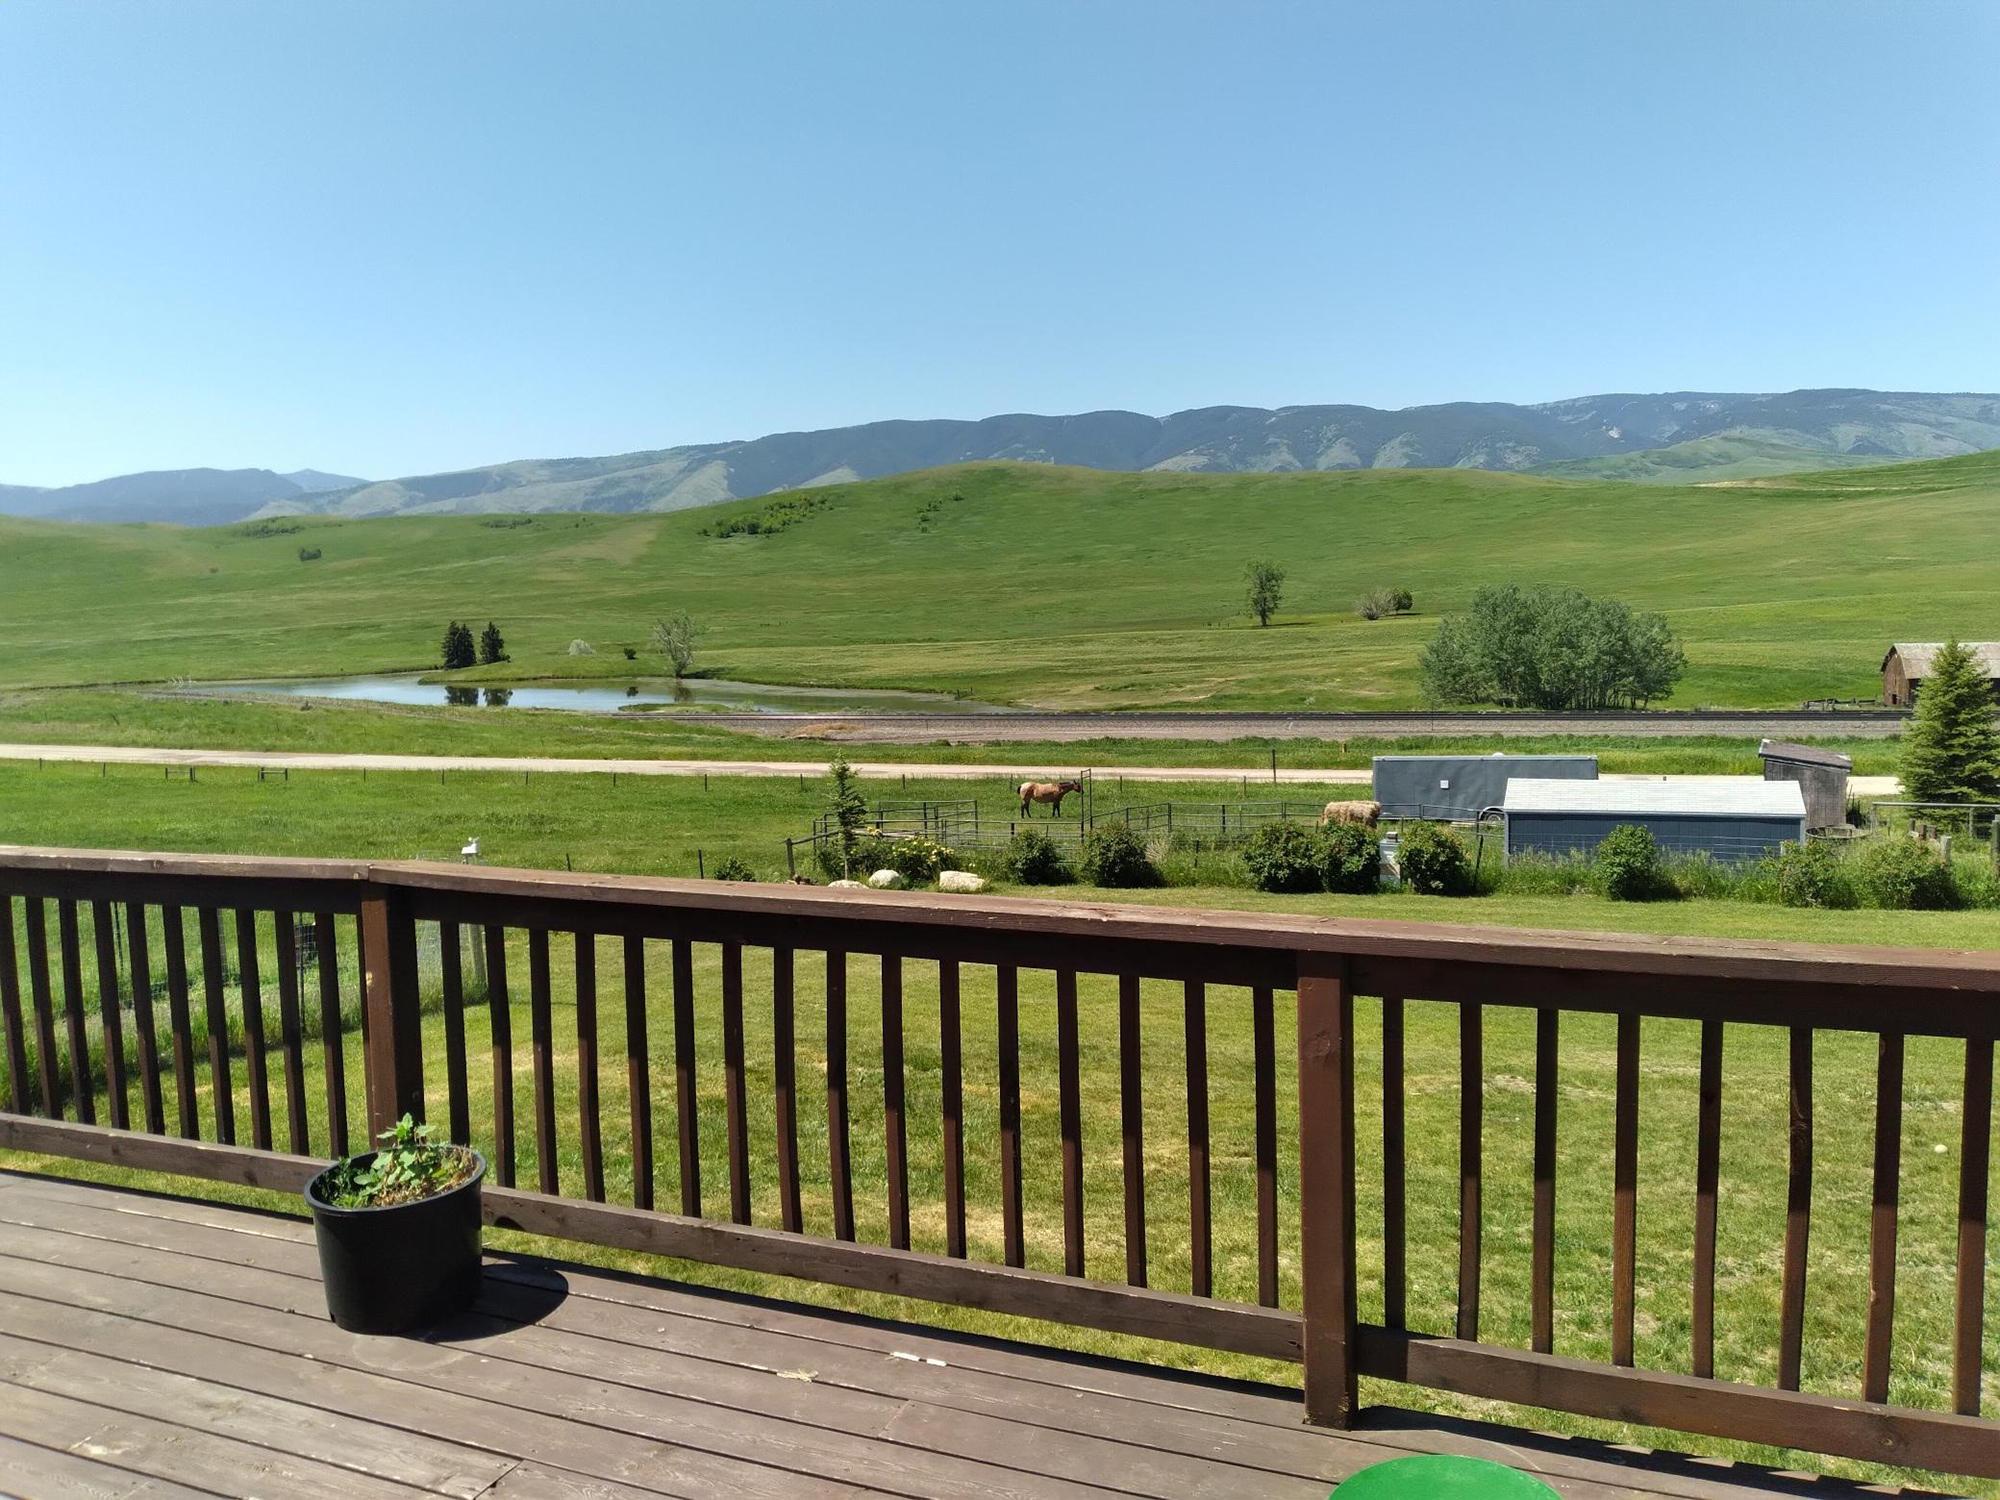 326 St Hwy 345, Parkman, Wyoming 82838, 3 Bedrooms Bedrooms, ,2 BathroomsBathrooms,Residential,For Sale,St Hwy 345,21-655